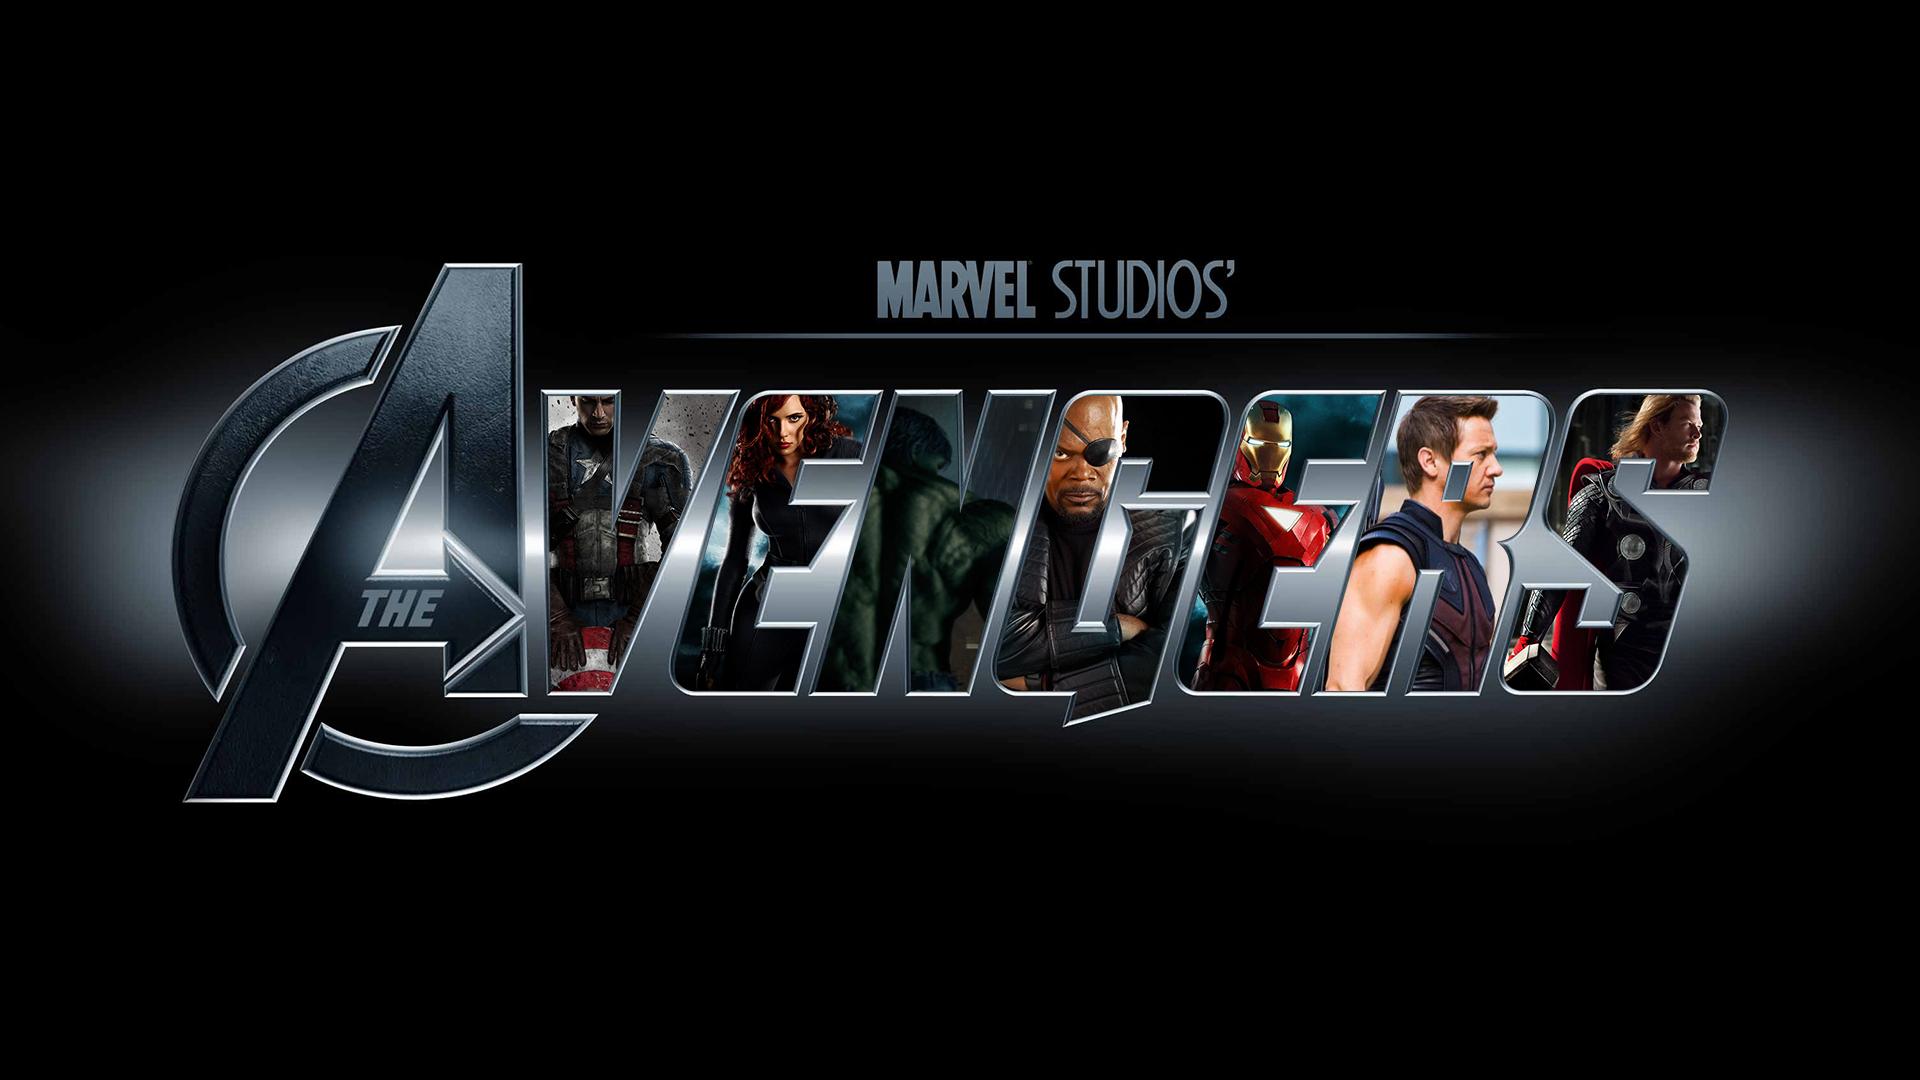 Best Avengers Wallpaper for Desktop Wide Screen Wallpaper 1080p2K 1920x1080